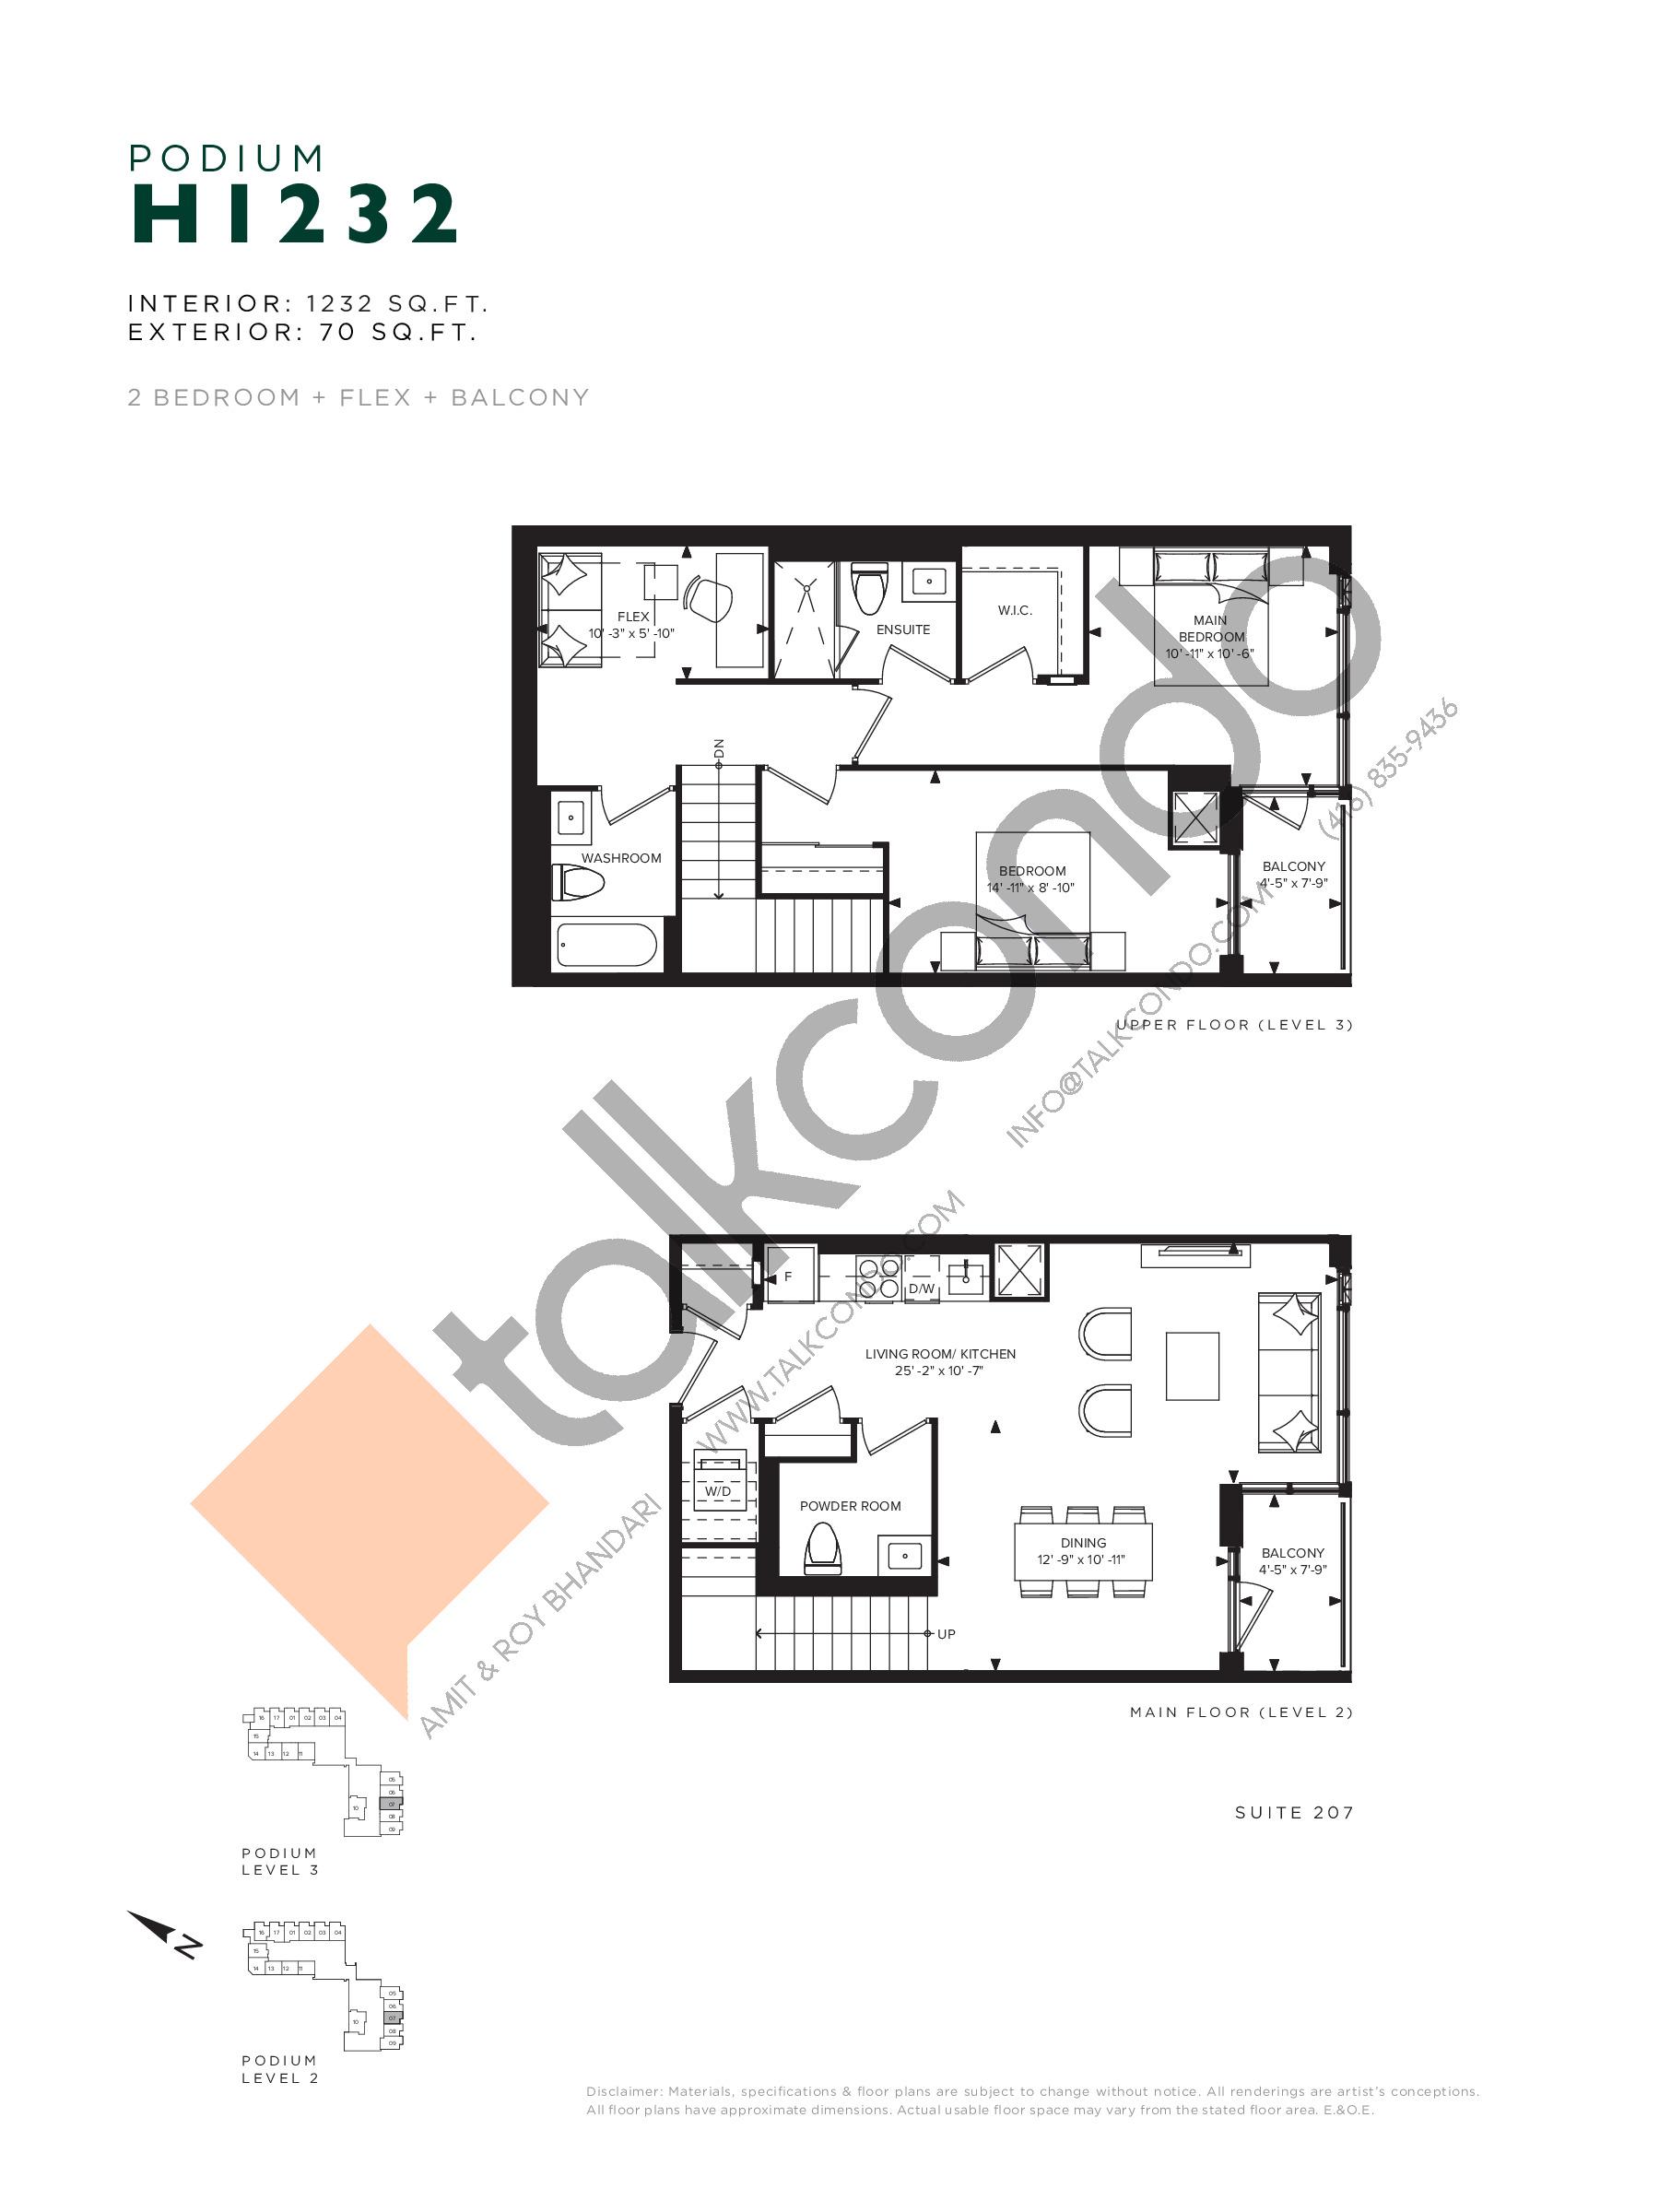 H1232 (Podium) Floor Plan at Hillmont at SXSW Condos - 1232 sq.ft